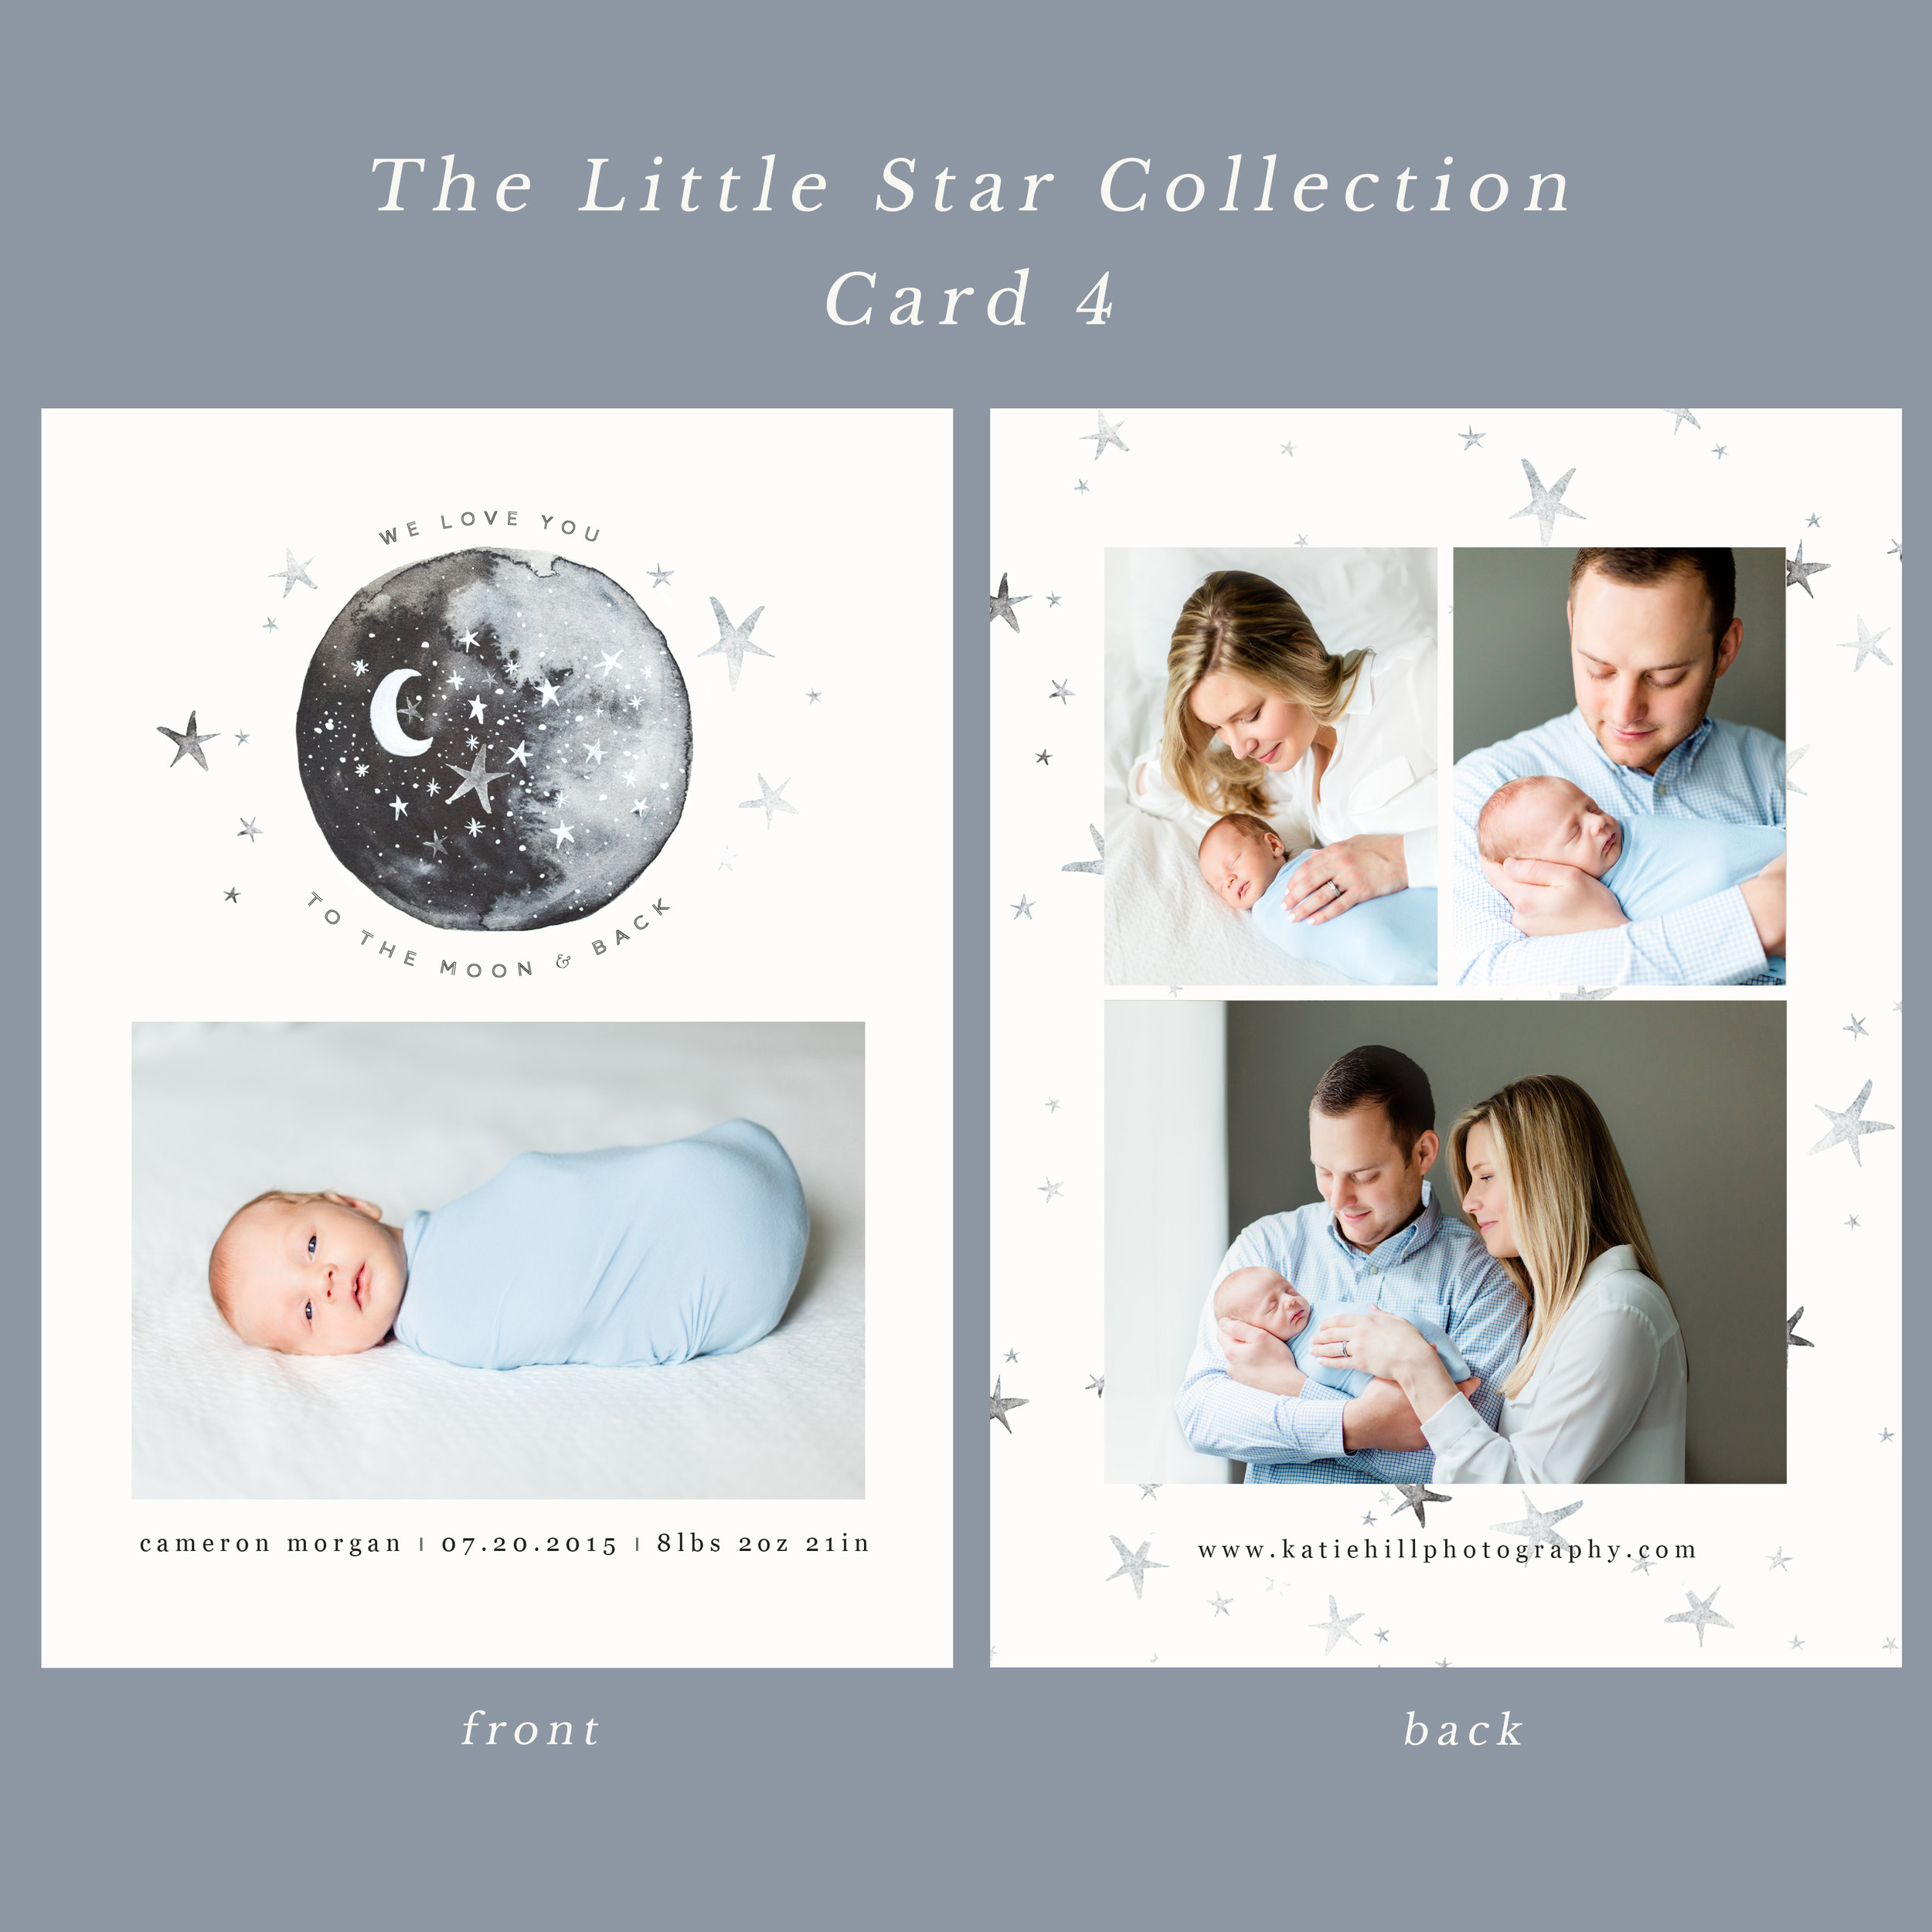 LittleStar_Card4.jpg